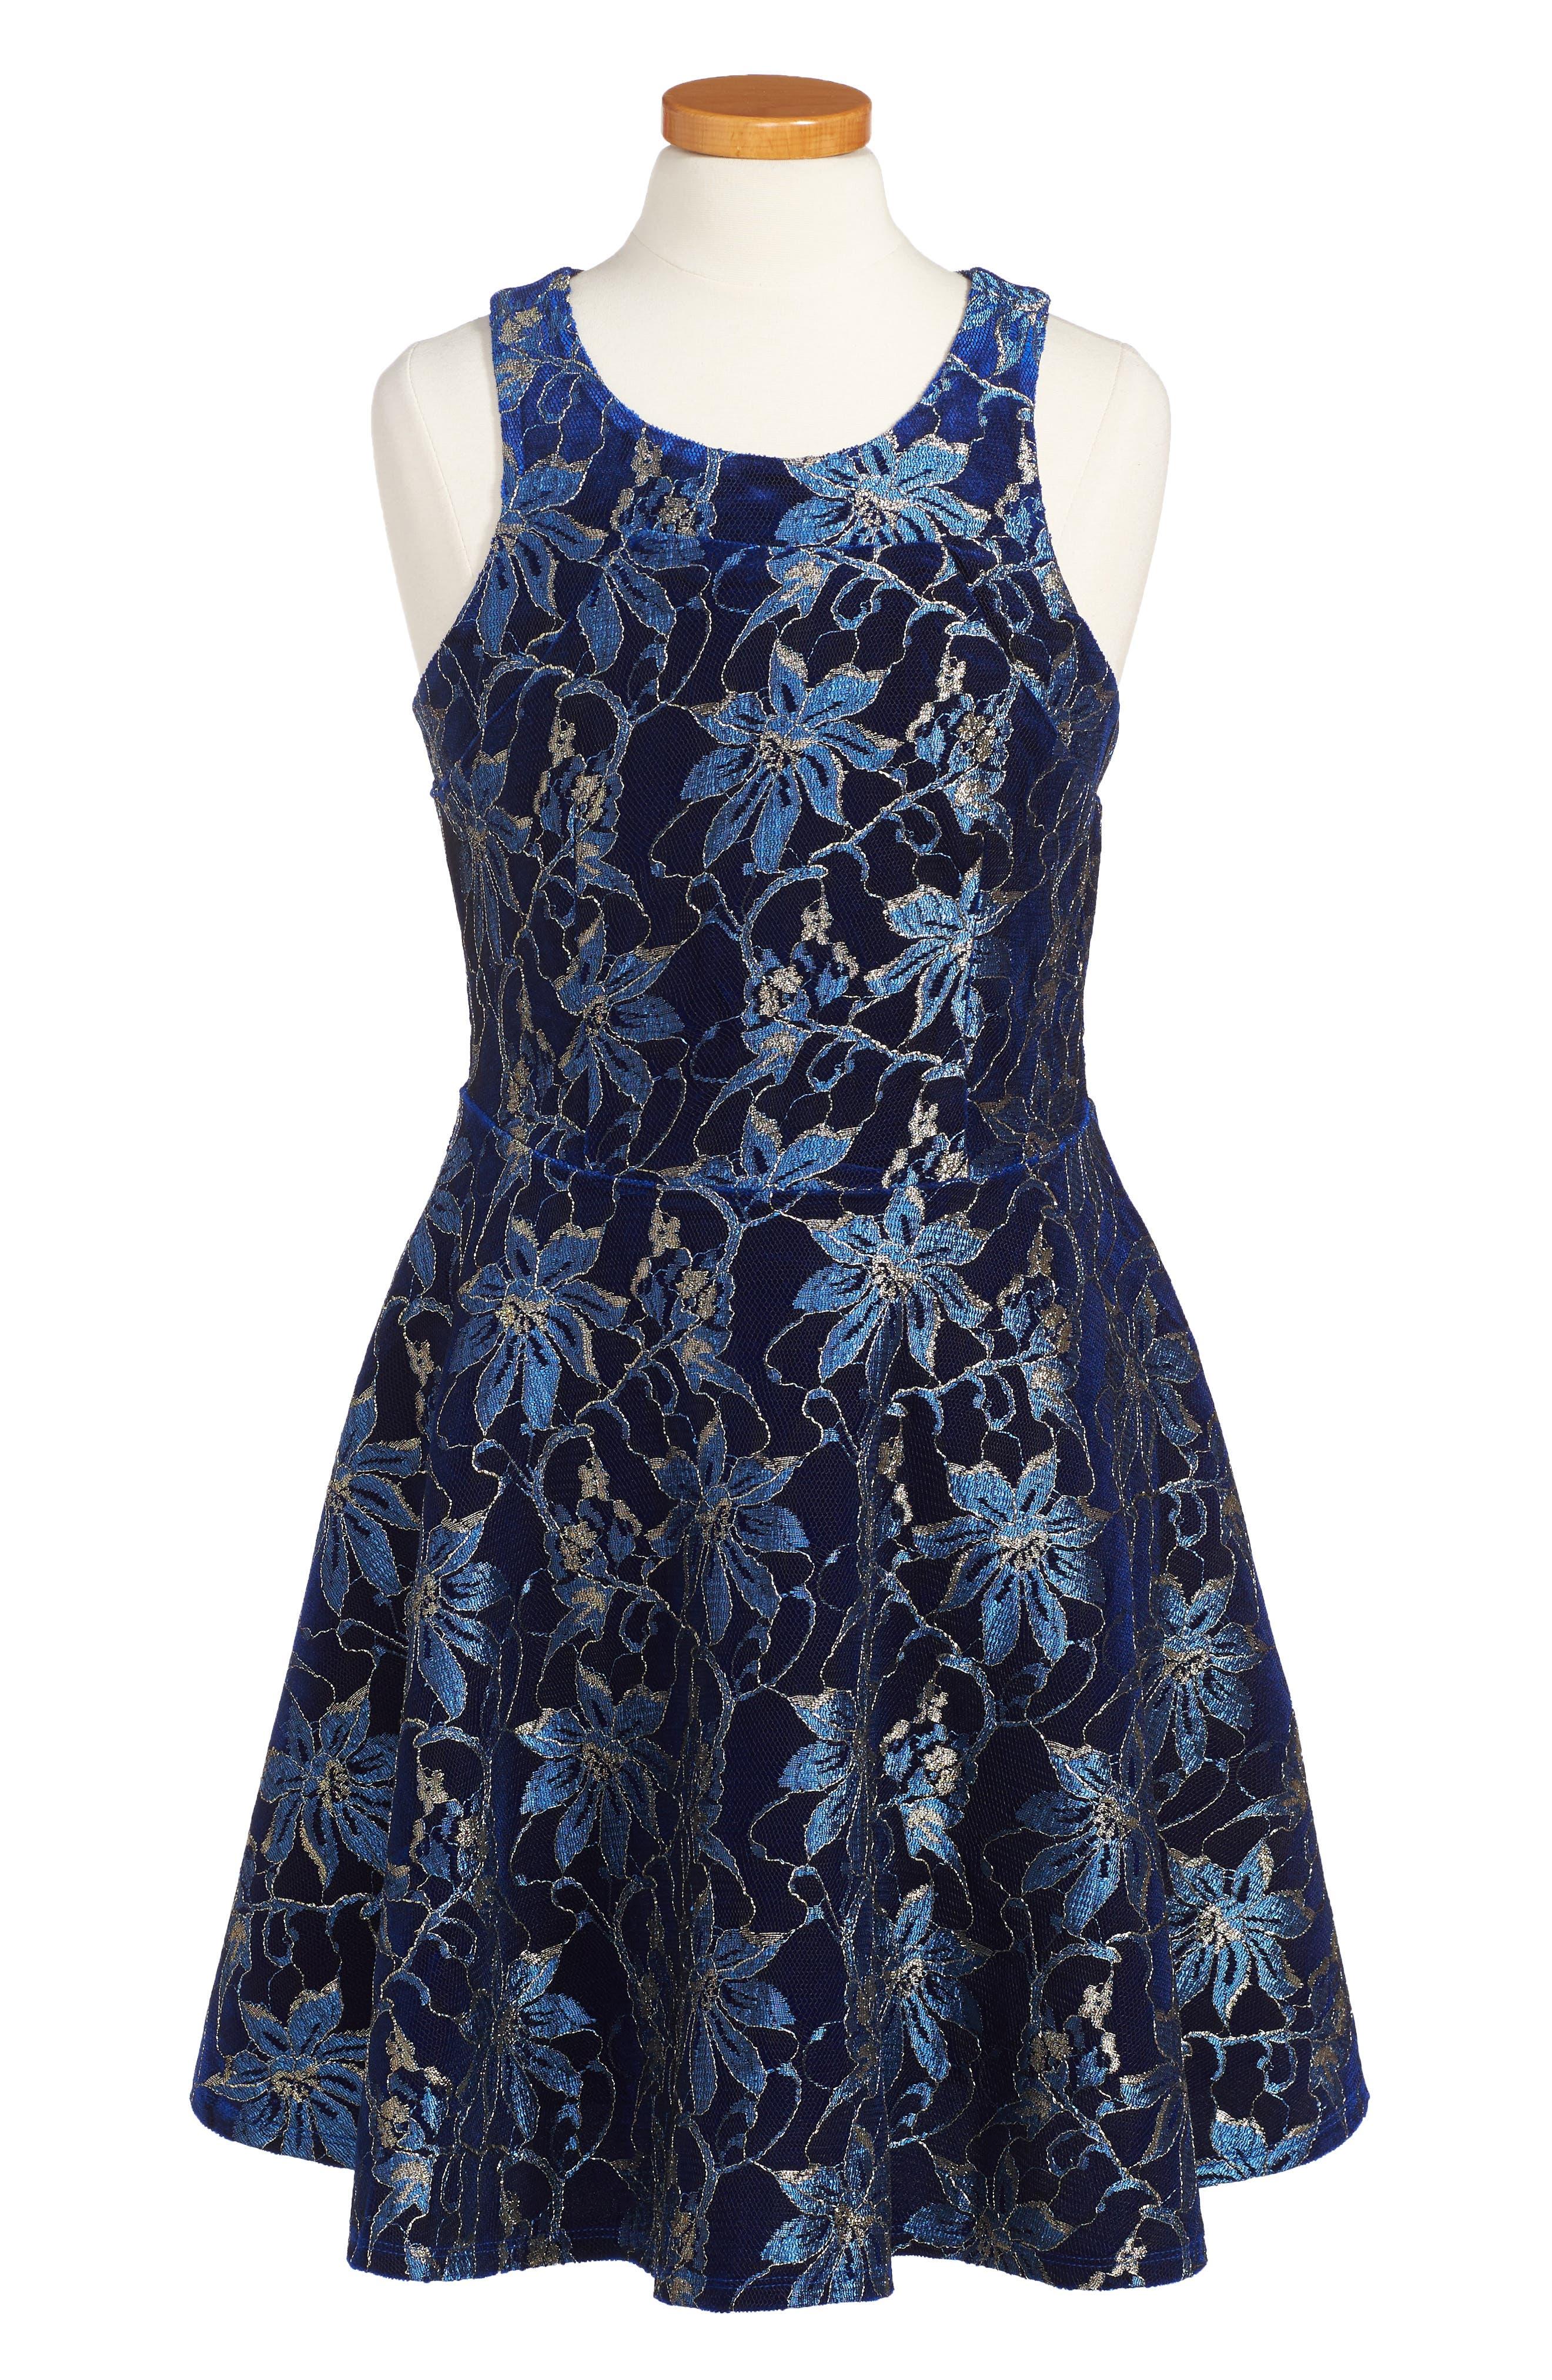 Heather Floral Mesh Dress,                             Main thumbnail 1, color,                             420